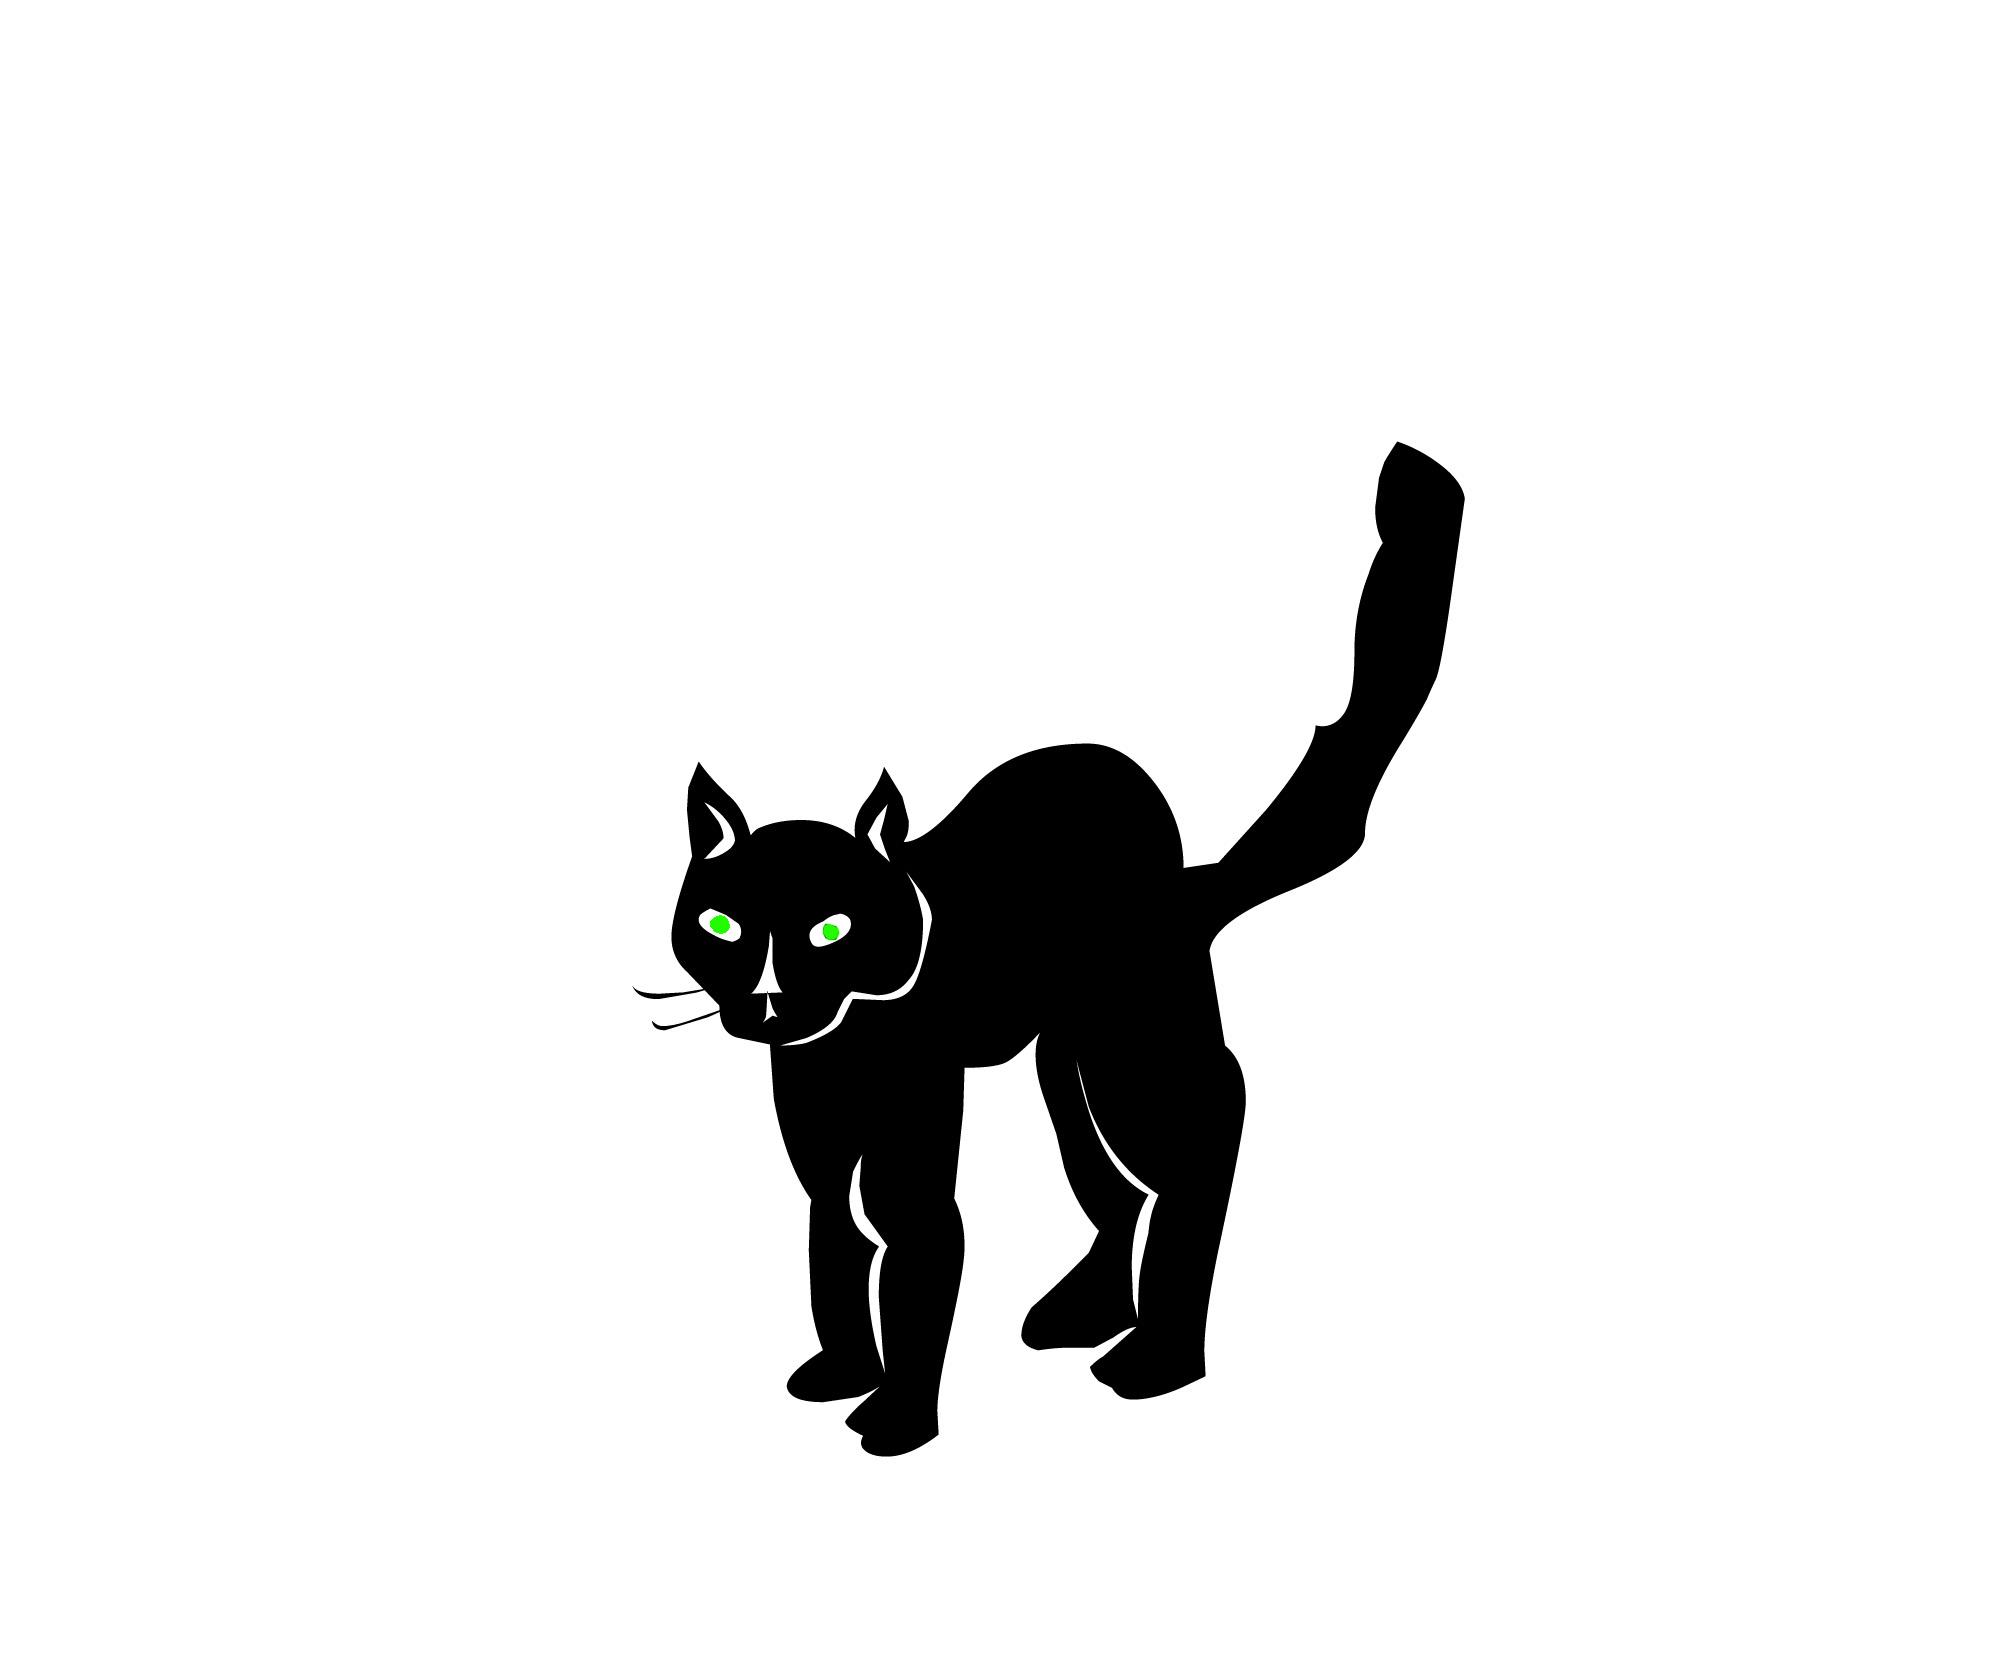 Glowing Cat Eyes Scary Creepy.